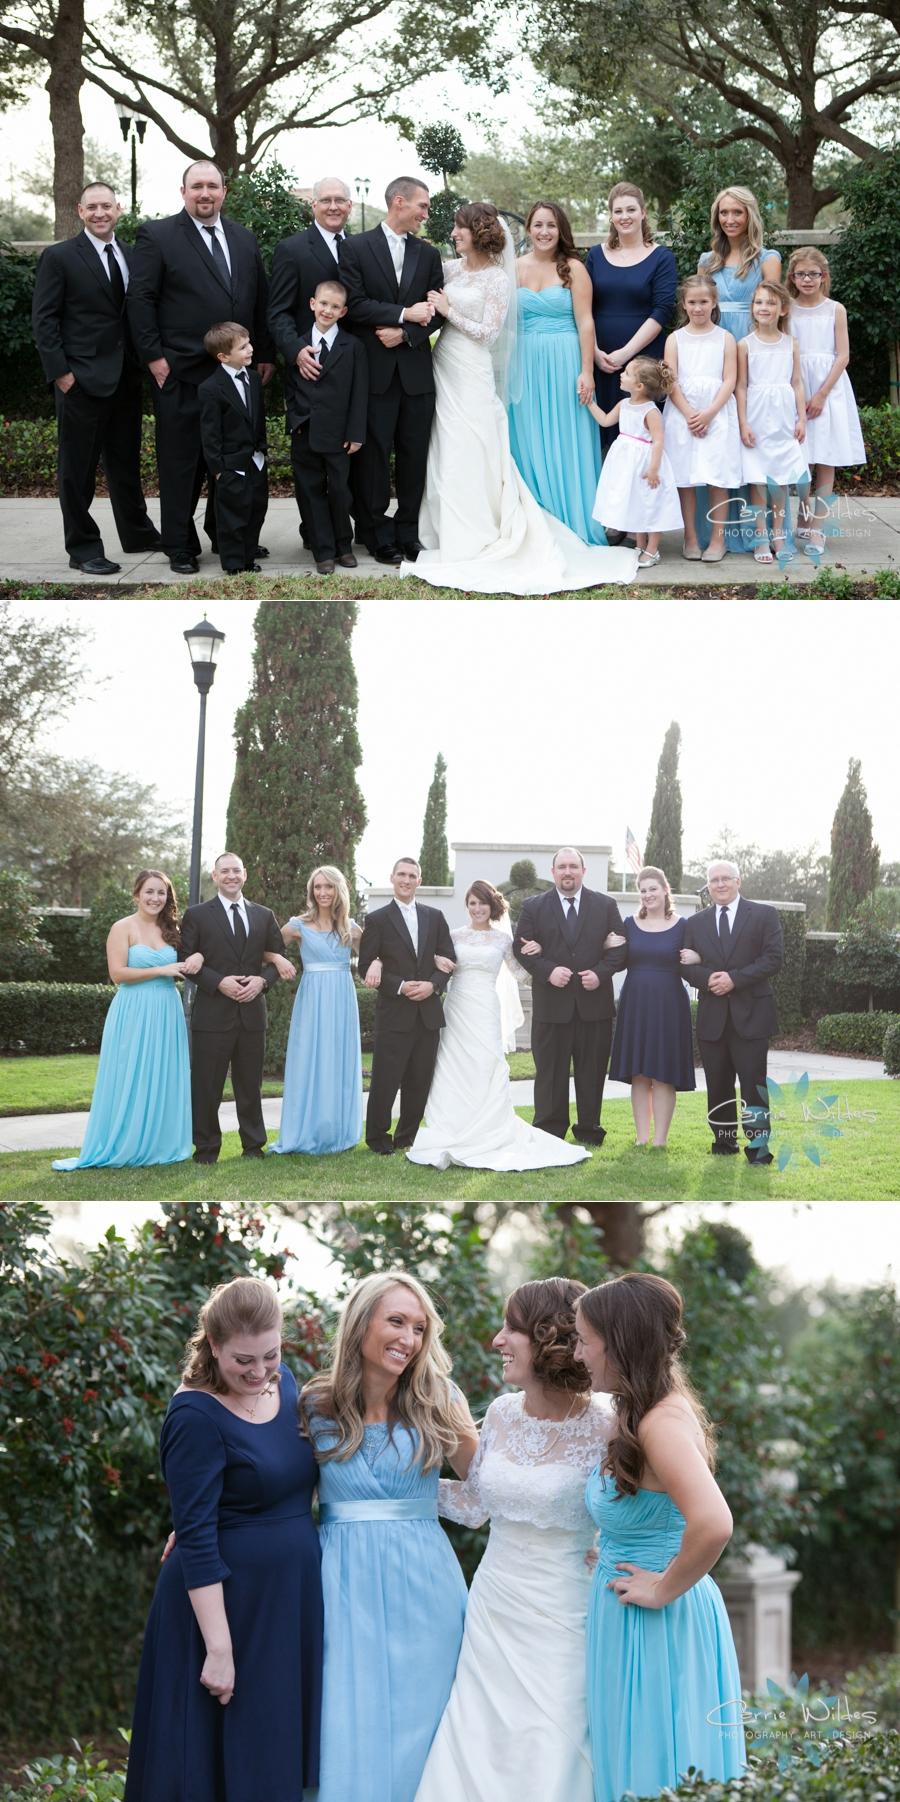 12_26_15 Palmetto Club Wedding_0011.jpg